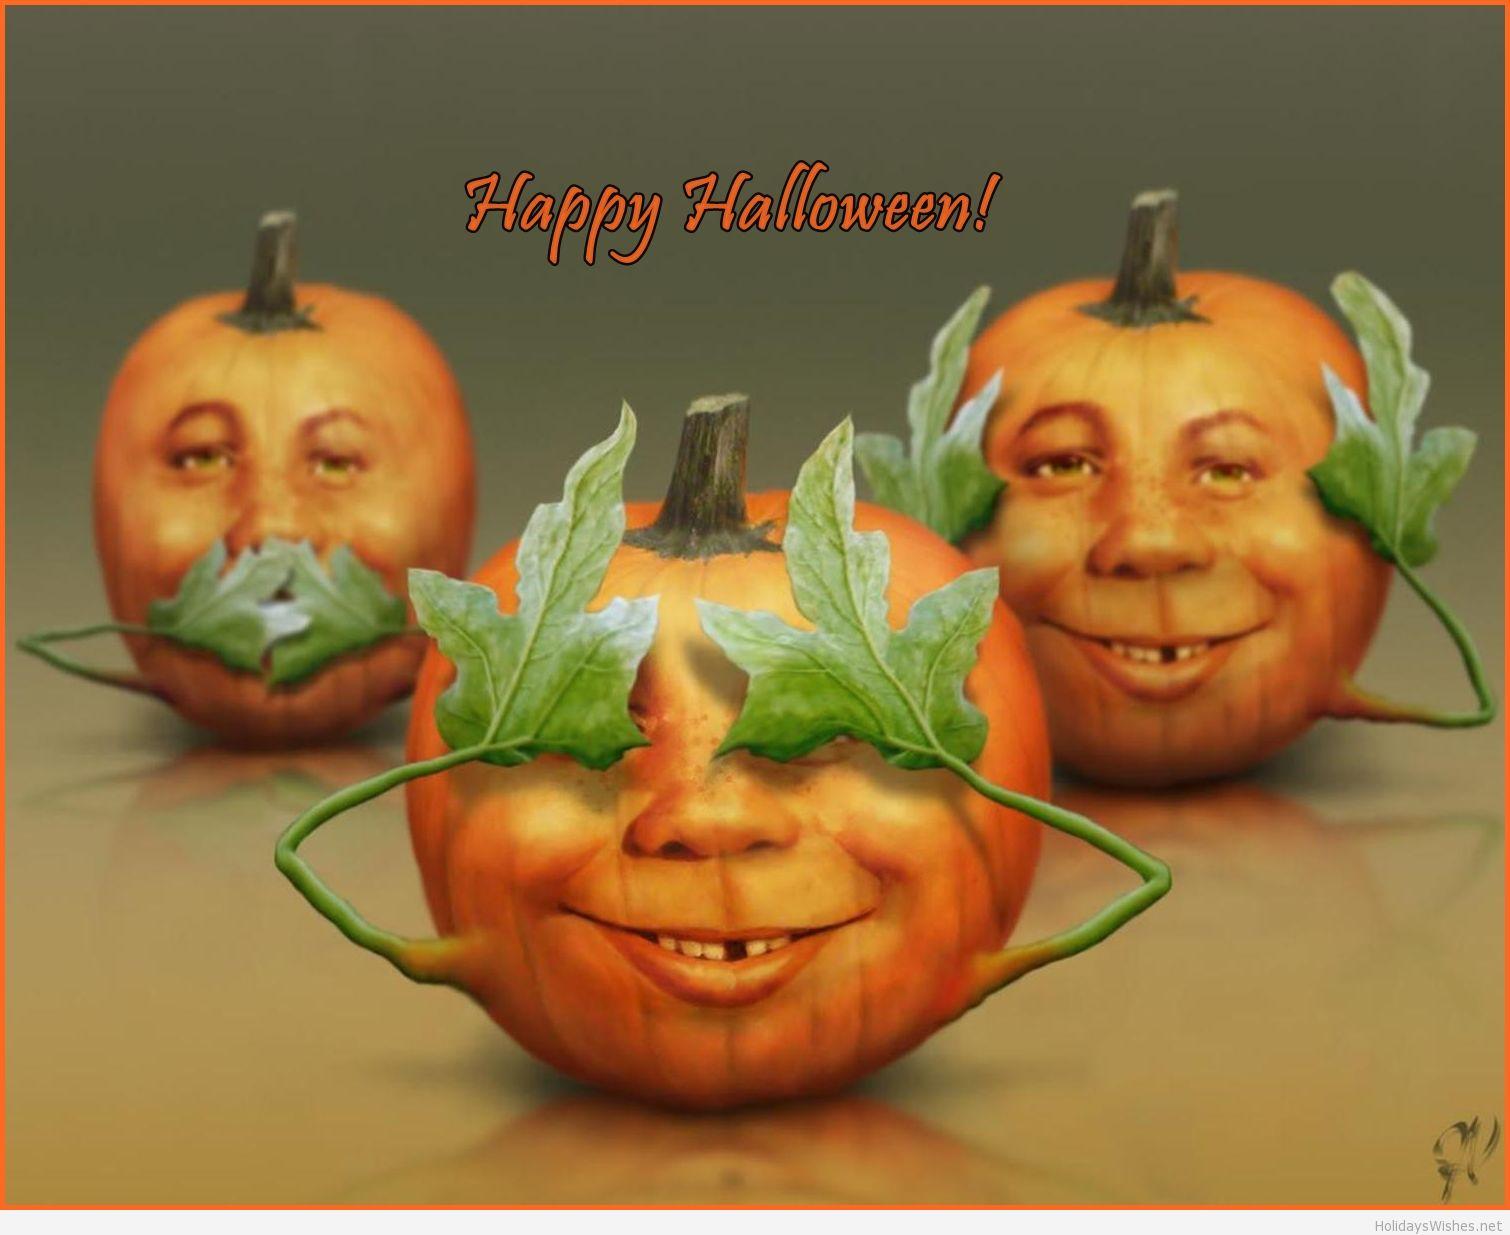 20 funny halloween pics animated gifs wallpapers entertainmentmesh - Funny happy halloween wallpaper ...